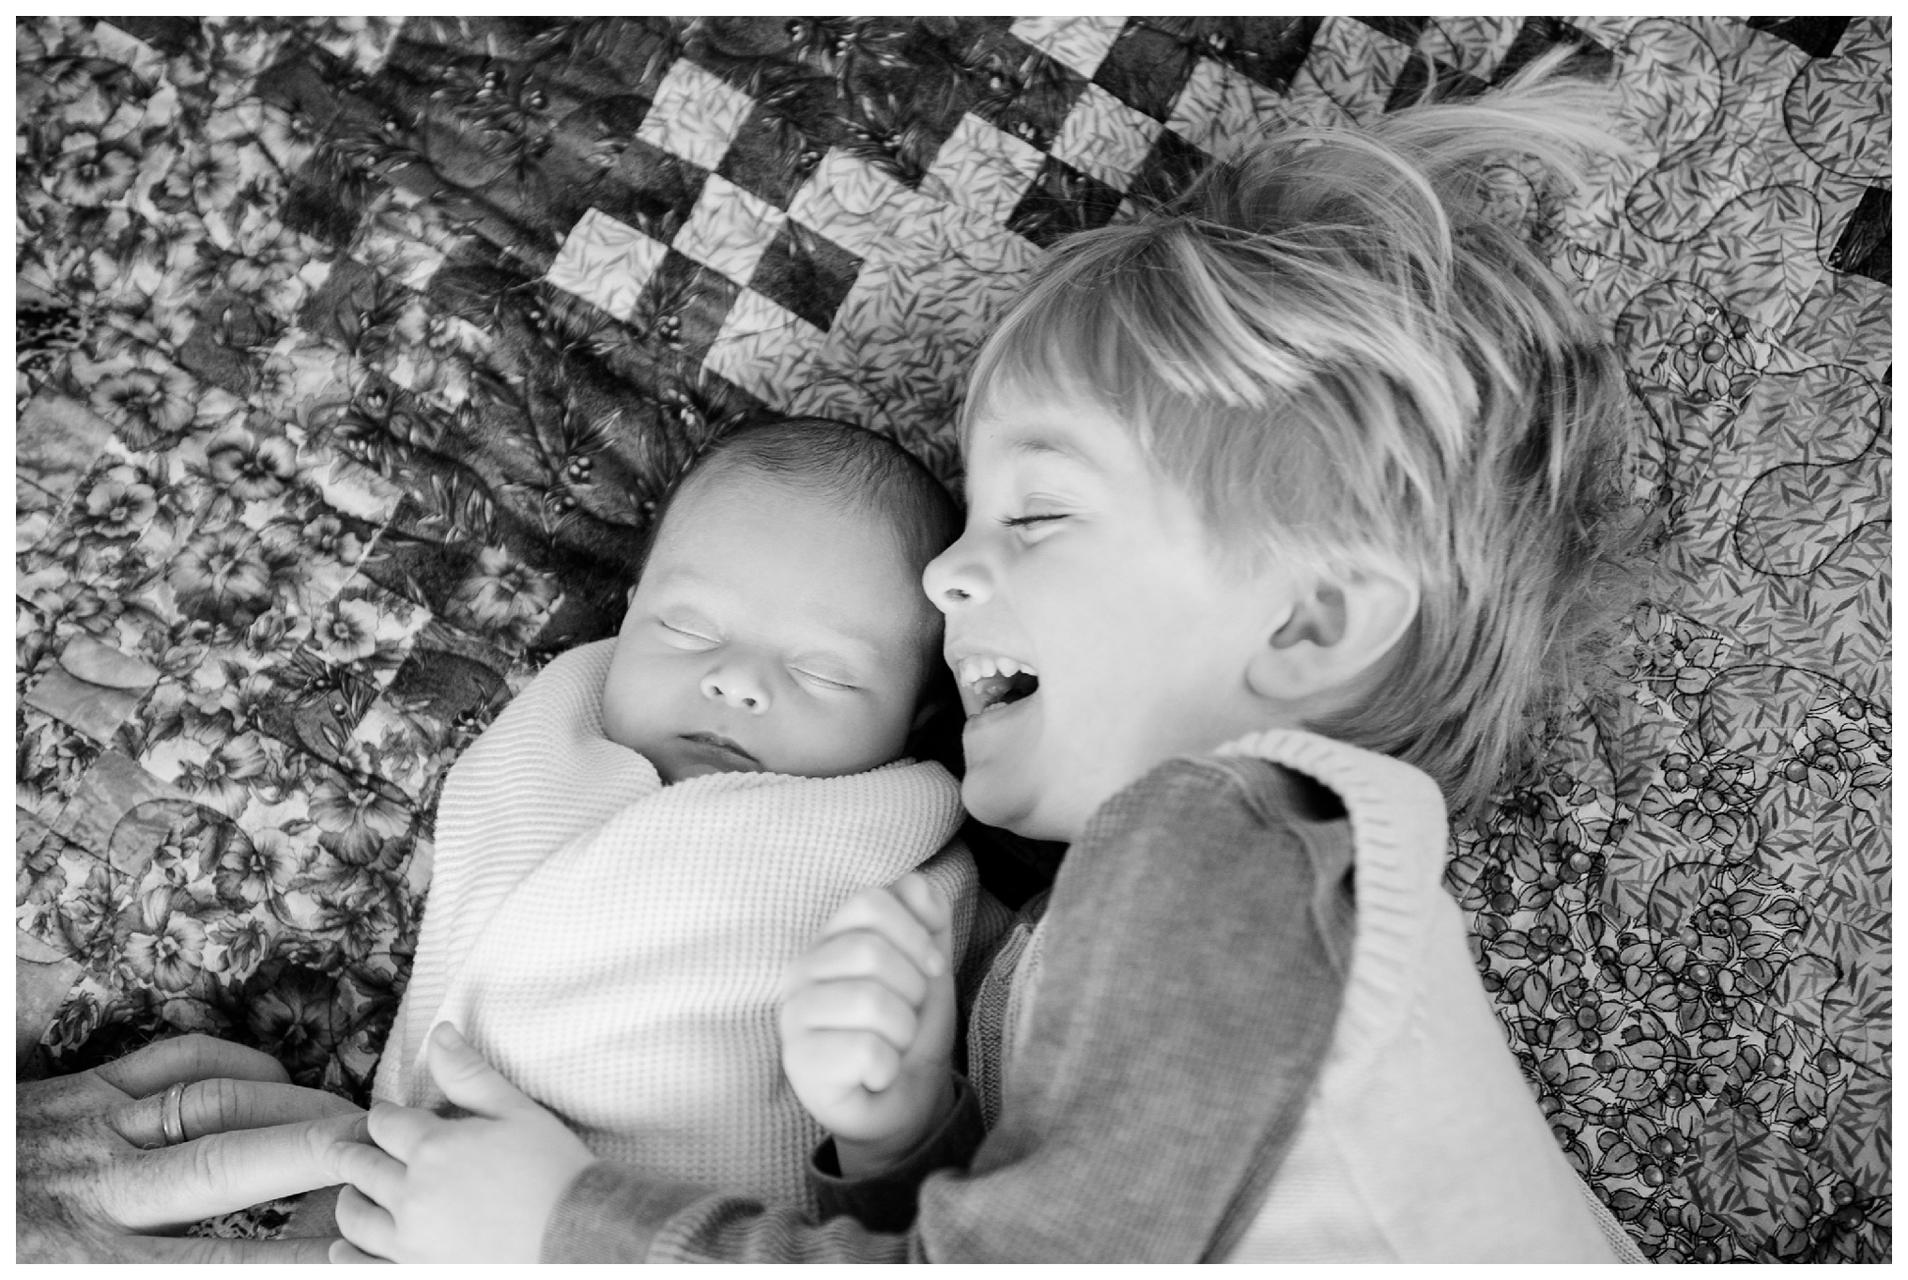 Newborn-Photographer-Sweet-Light-Portraits04.jpg